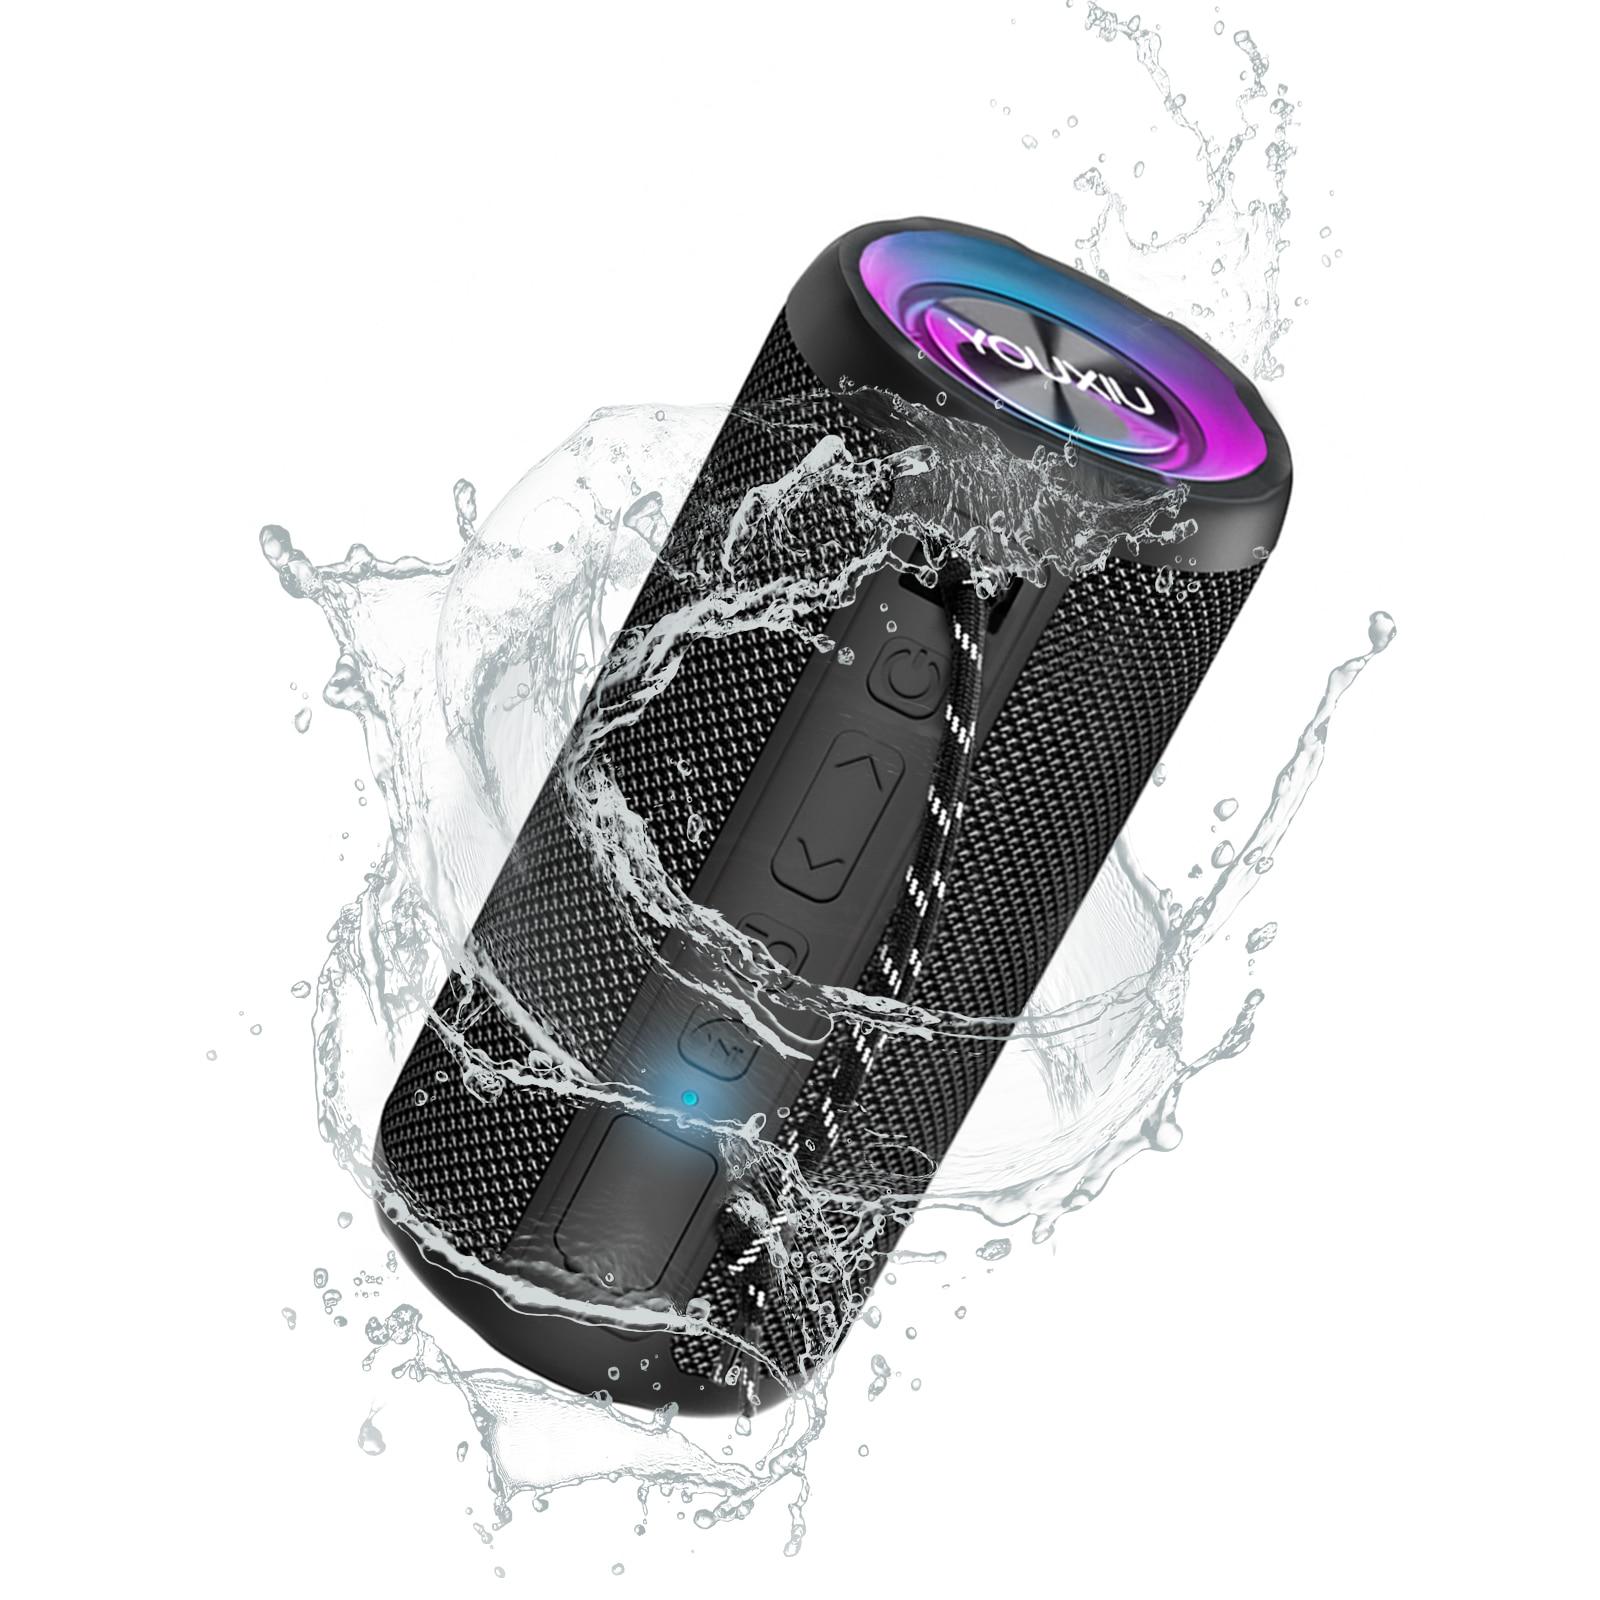 YOUXIU-مكبر صوت محمول ، لاسلكي ، بلوتوث ، 20 واط ، IPX7 ، مقاوم للماء ، عمر بطارية 20 ساعة ، مضخم صوت ستيريو TWS ، صوت خارجي